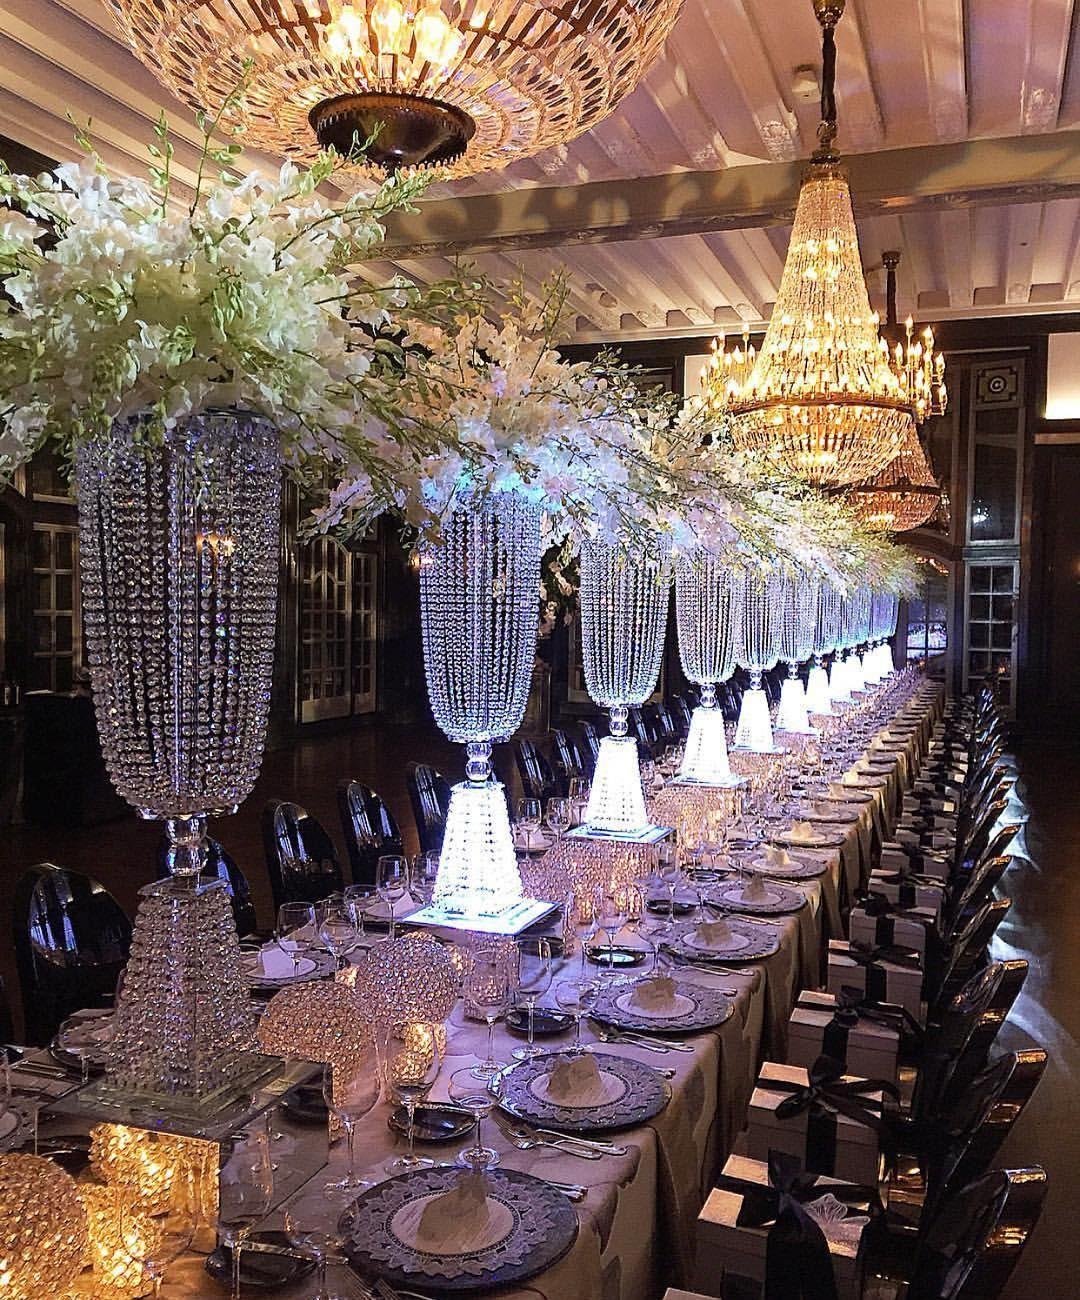 Magnificently GLAMOROUS! #tabledecor #regramlove @annebargebride #bride…